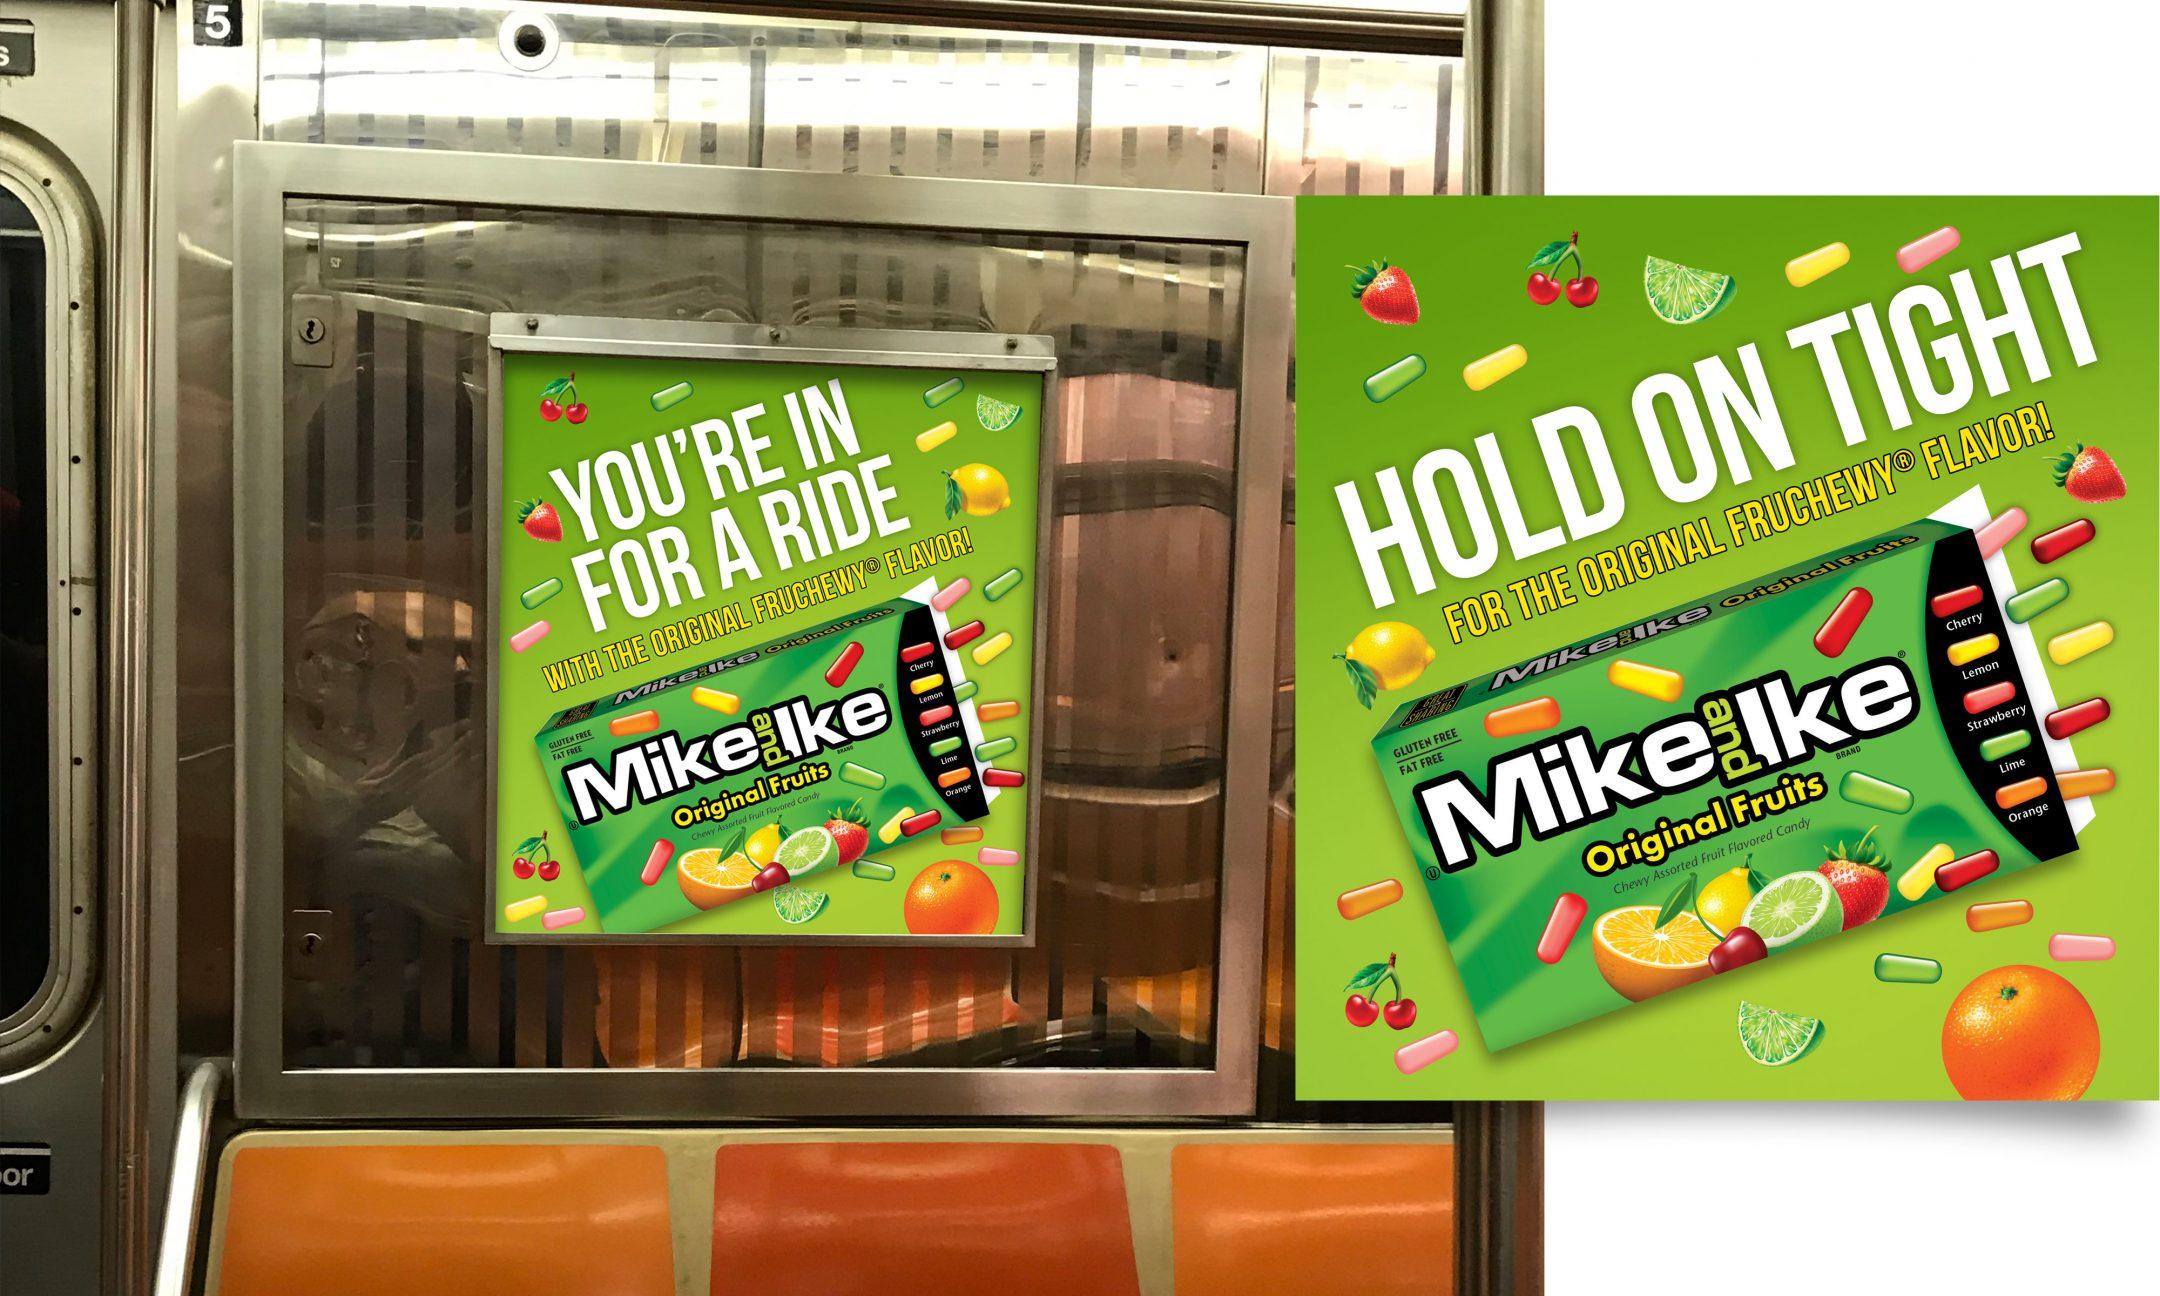 Mike and Ike Original Mix Subway